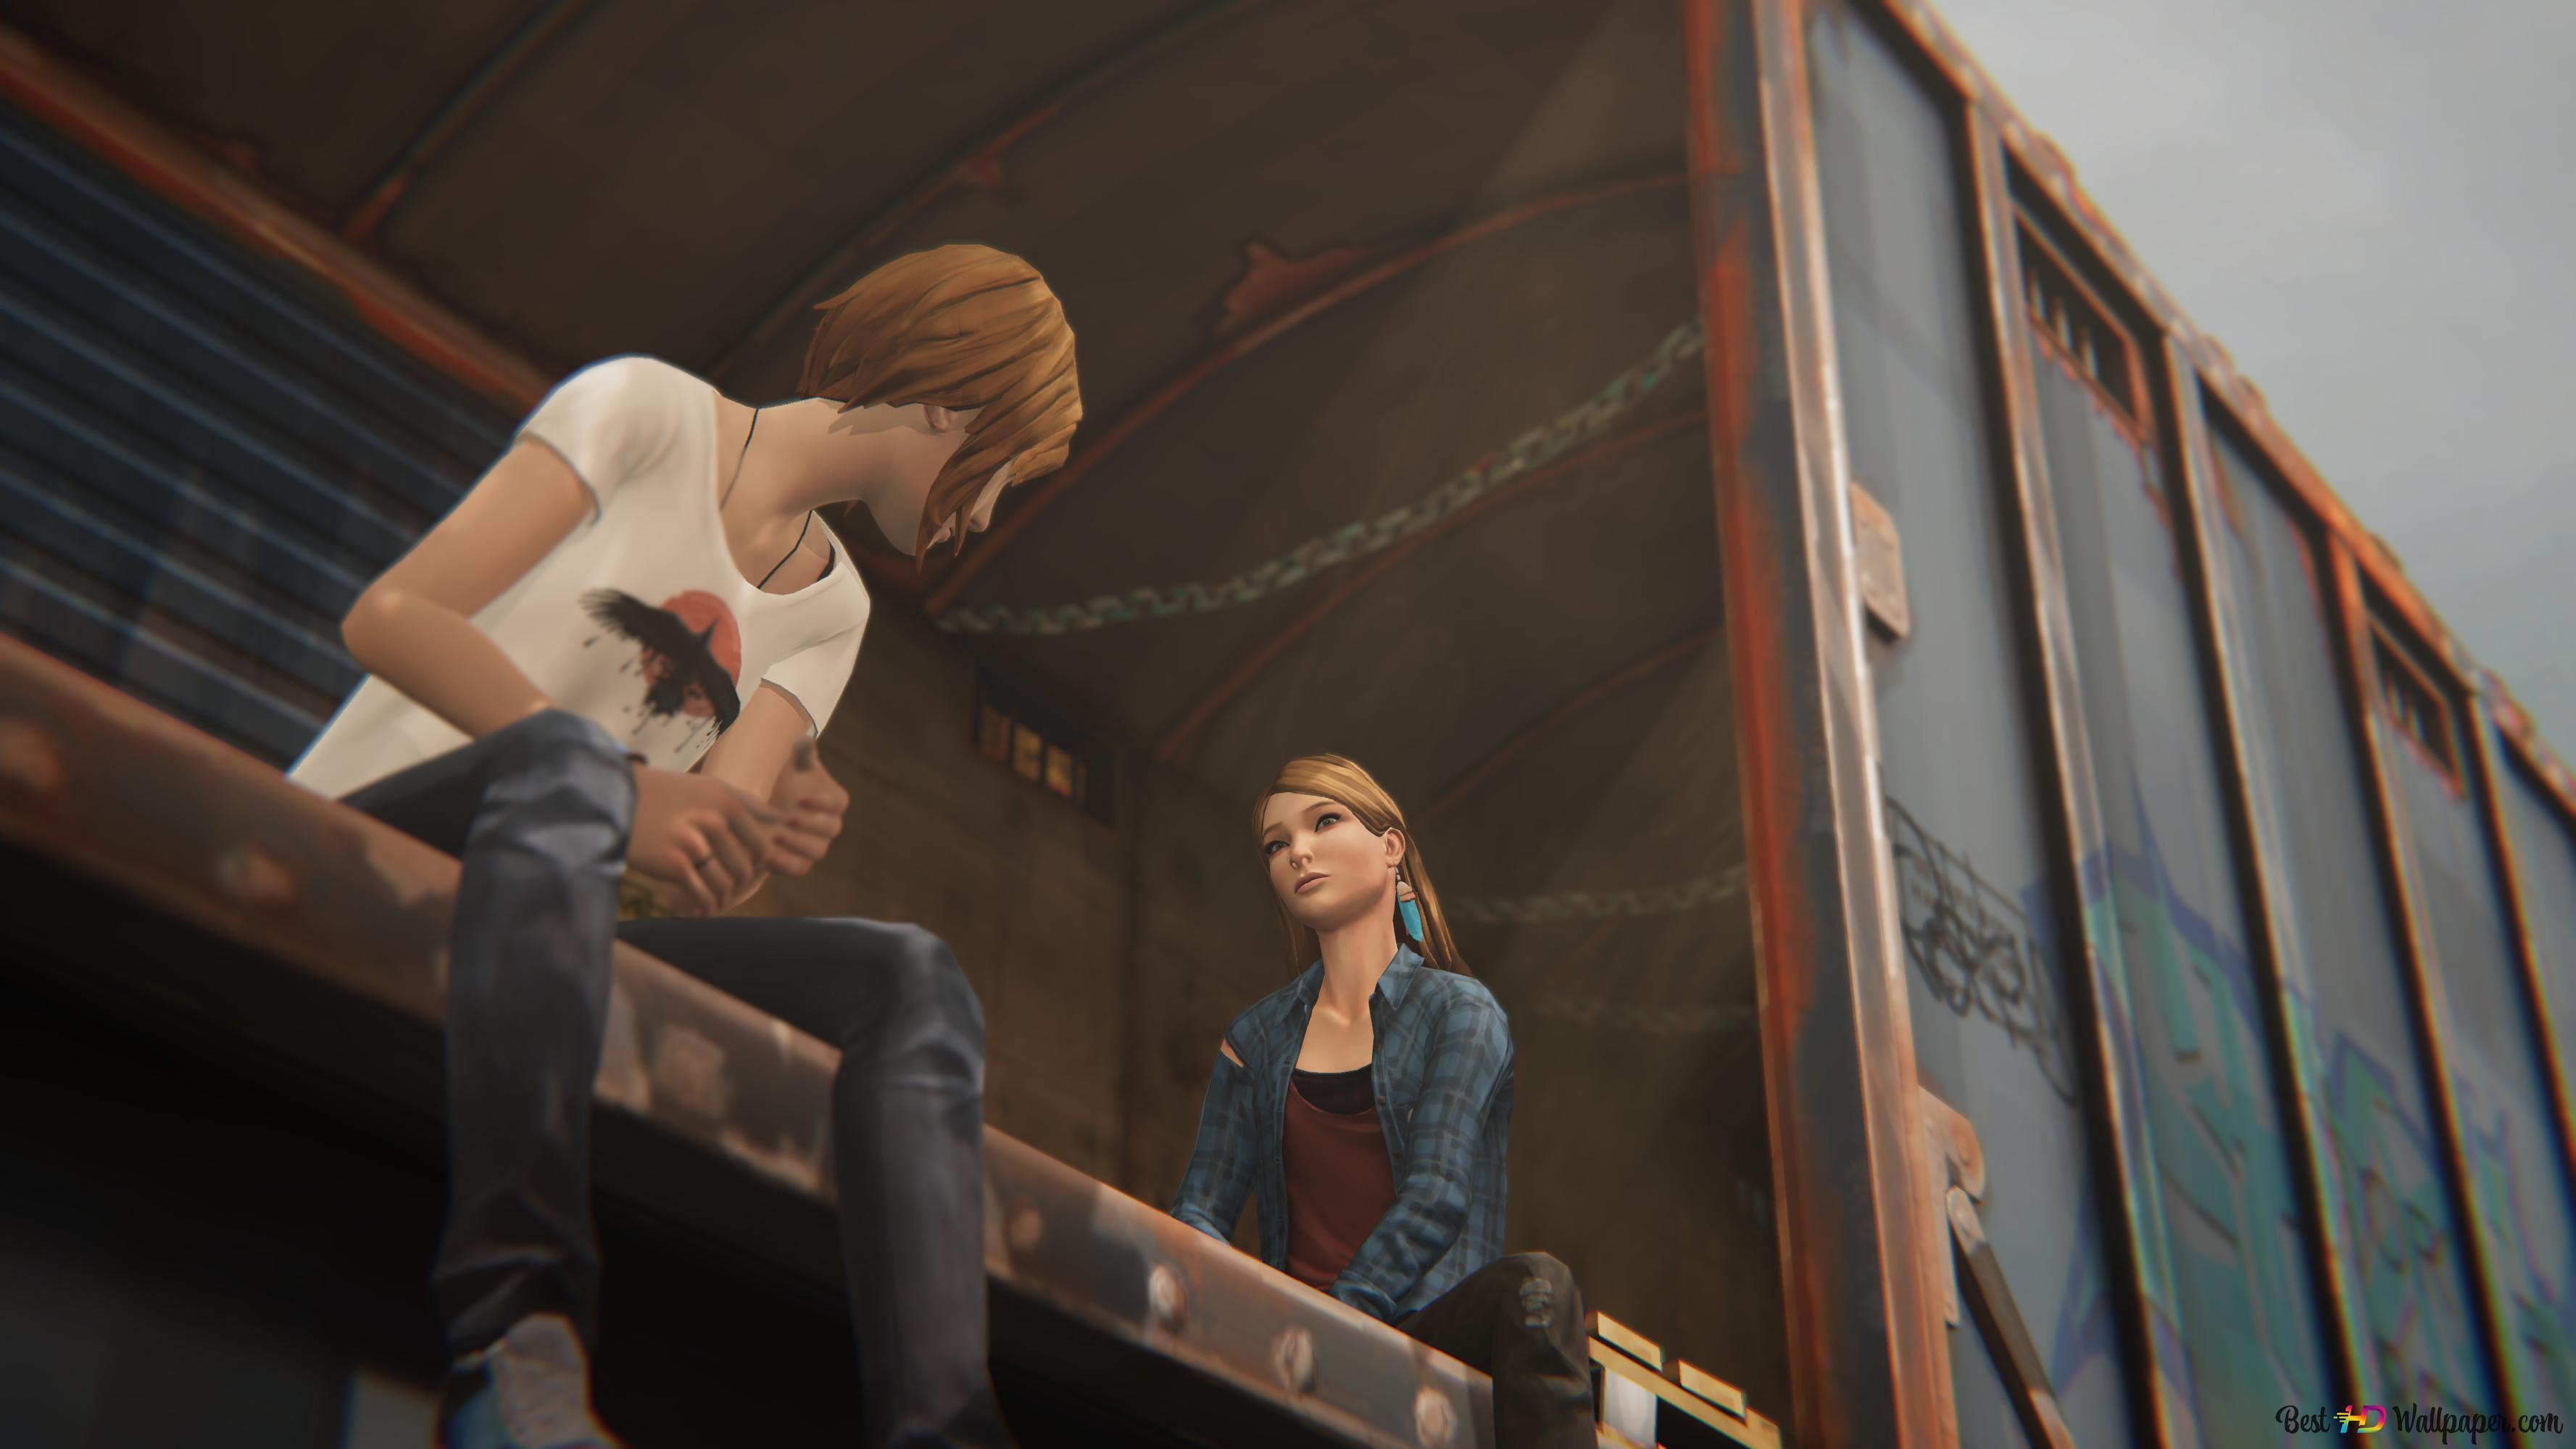 Chloe Price Prequel Life Is Strange Hd Wallpaper Download